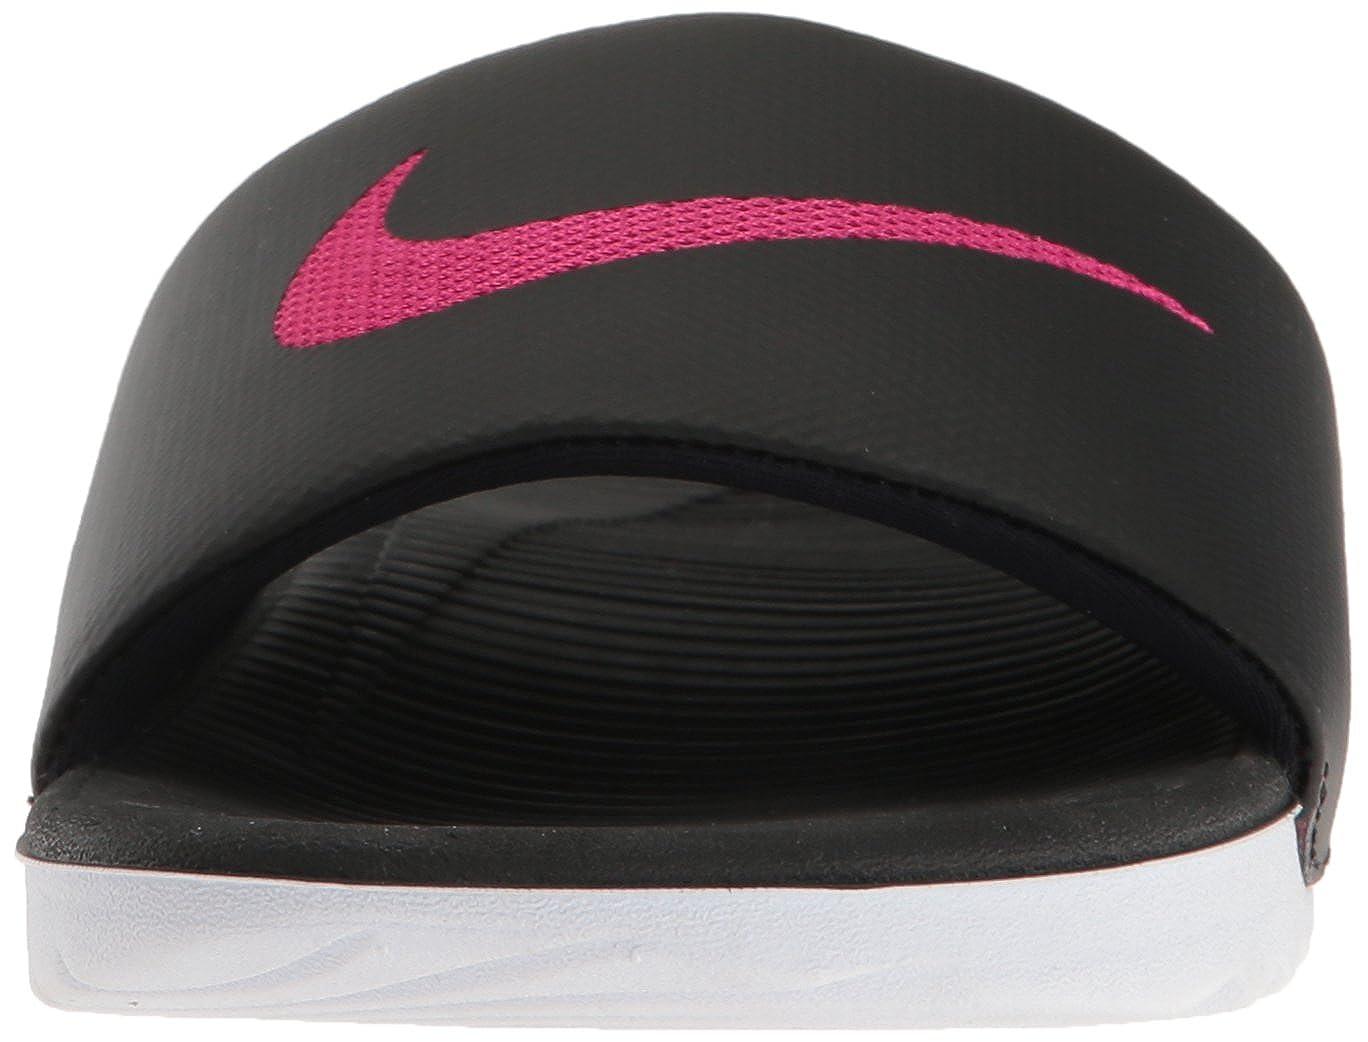 NIKE Damen Mehrfarbig WMNS Kawa Slide Sneakers, Mehrfarbig Damen (schwarz/Vivid Pink 001) 019107